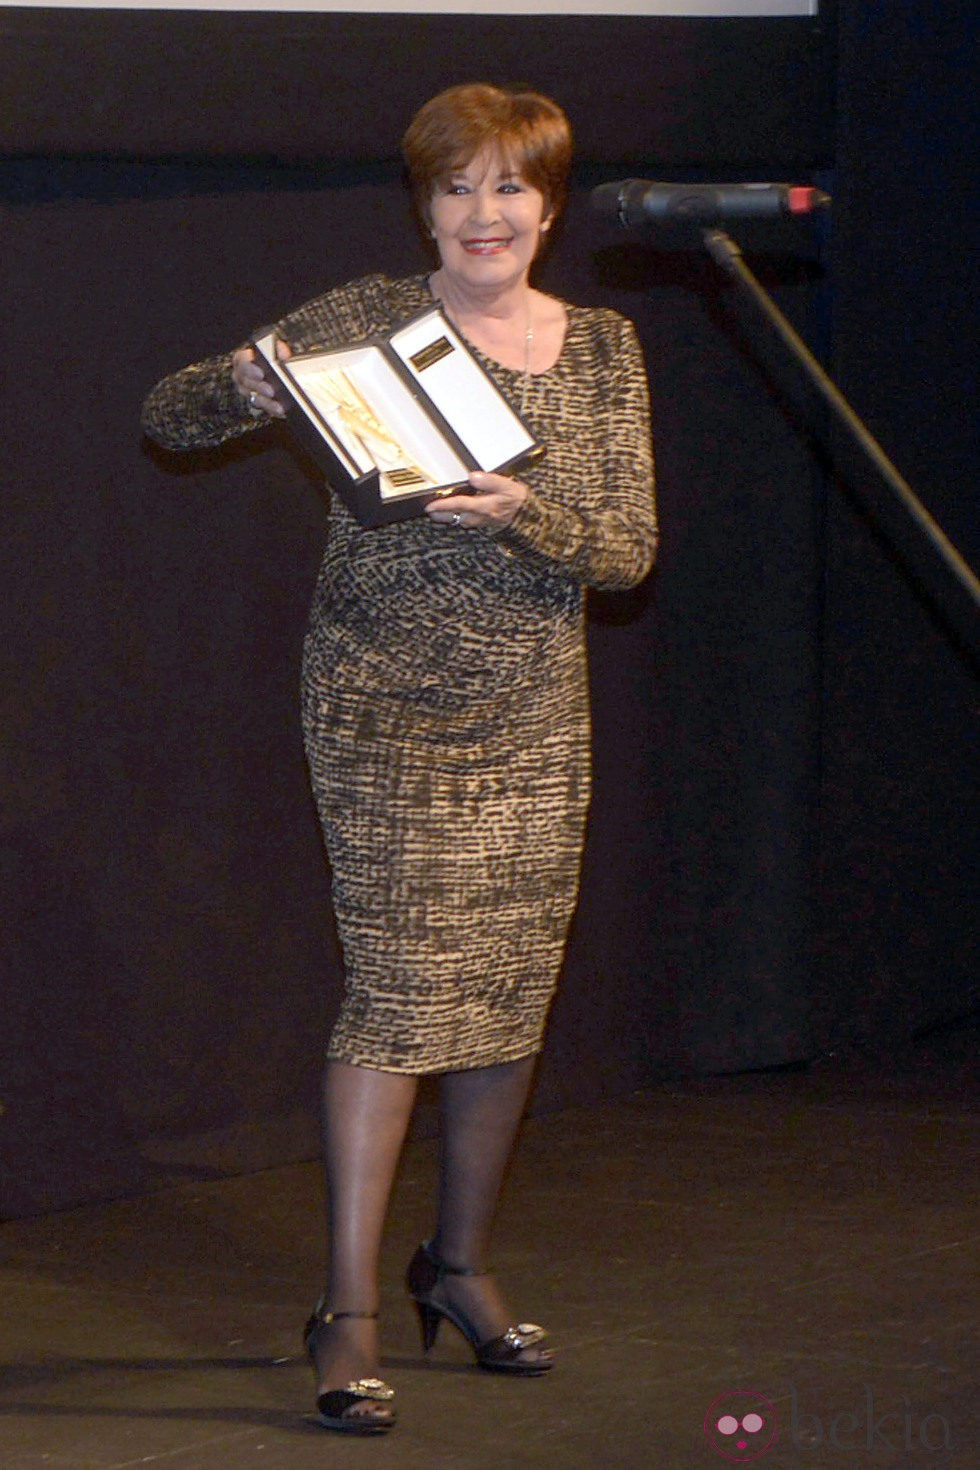 Concha Velasco con la Espiga de Oro de Honor de la Seminci 2013